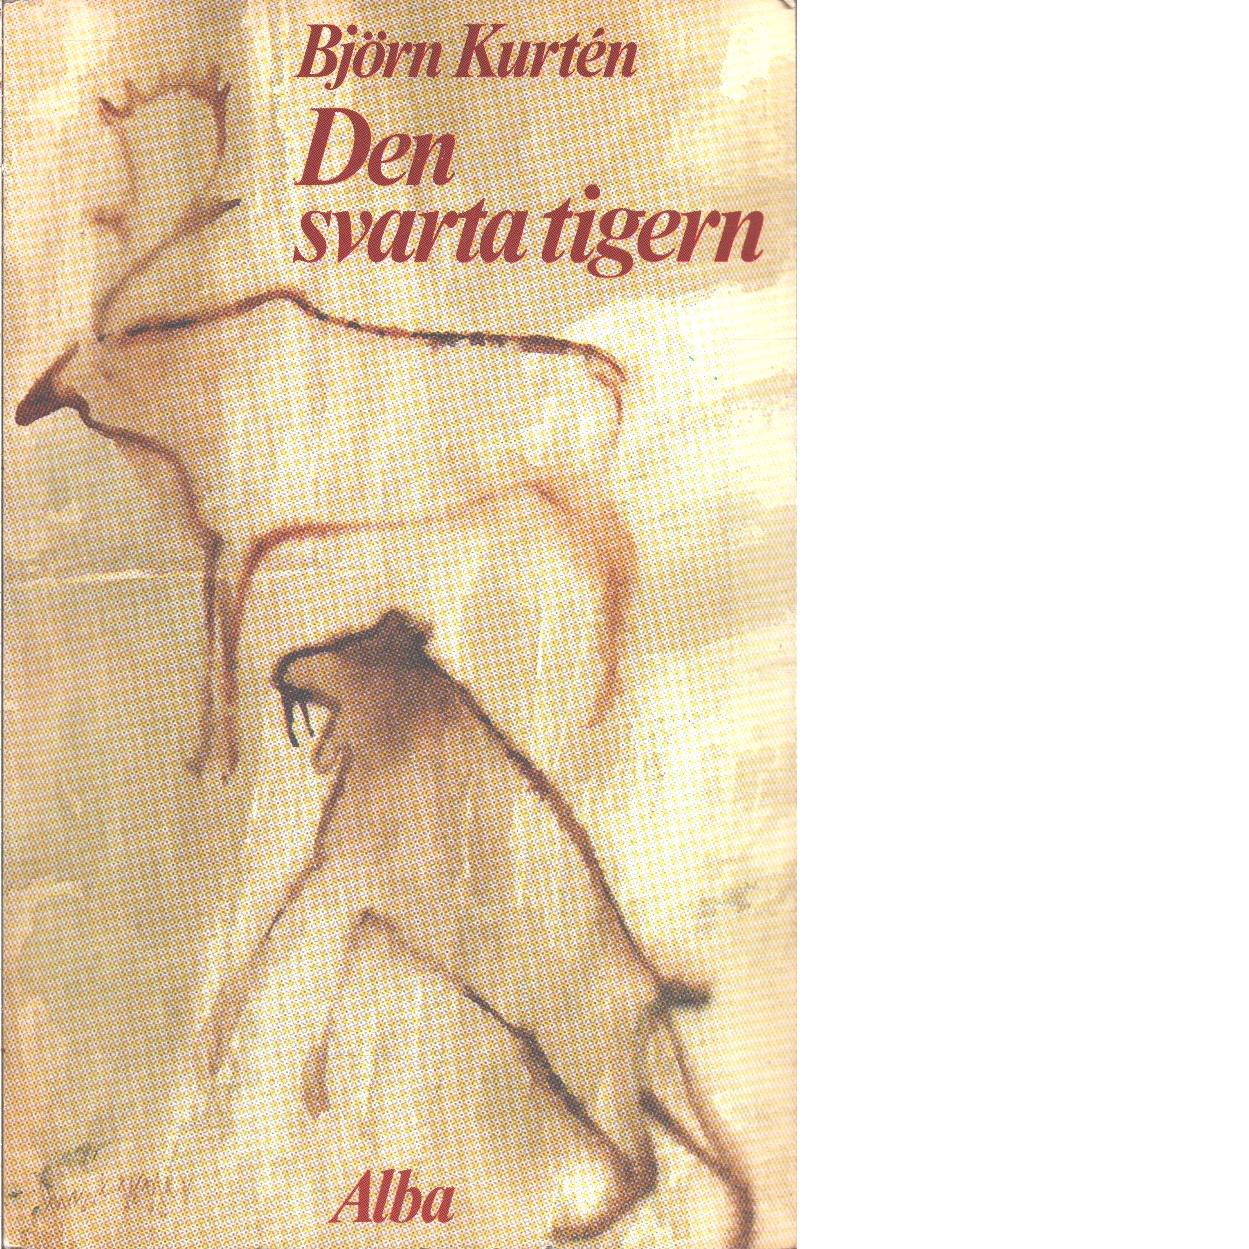 Den svarta tigern  - Kurtén, Björn